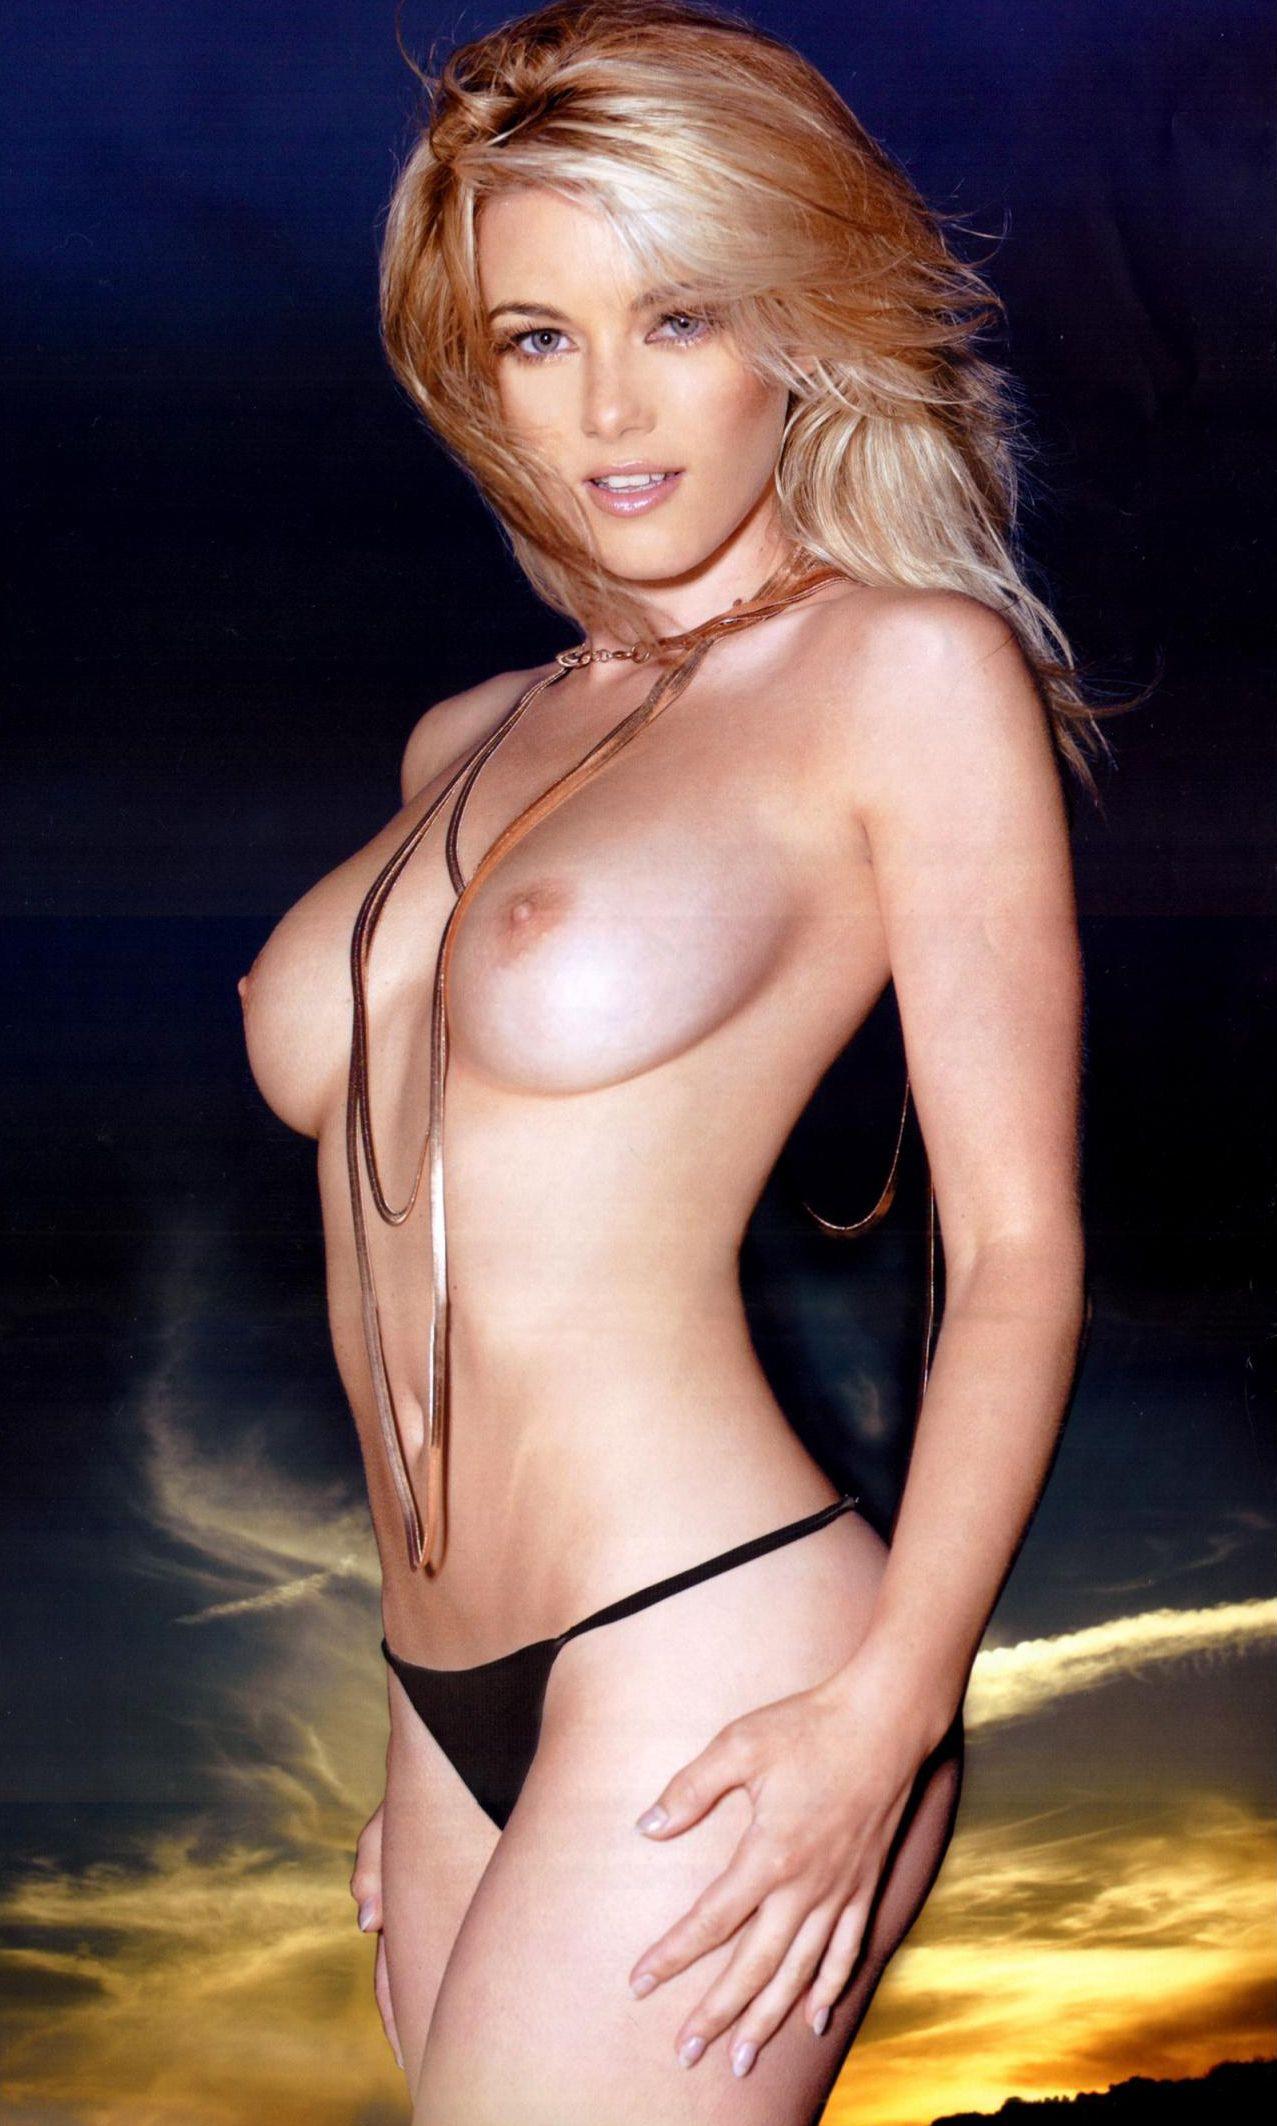 Katie downes nude pics, pettite black ass